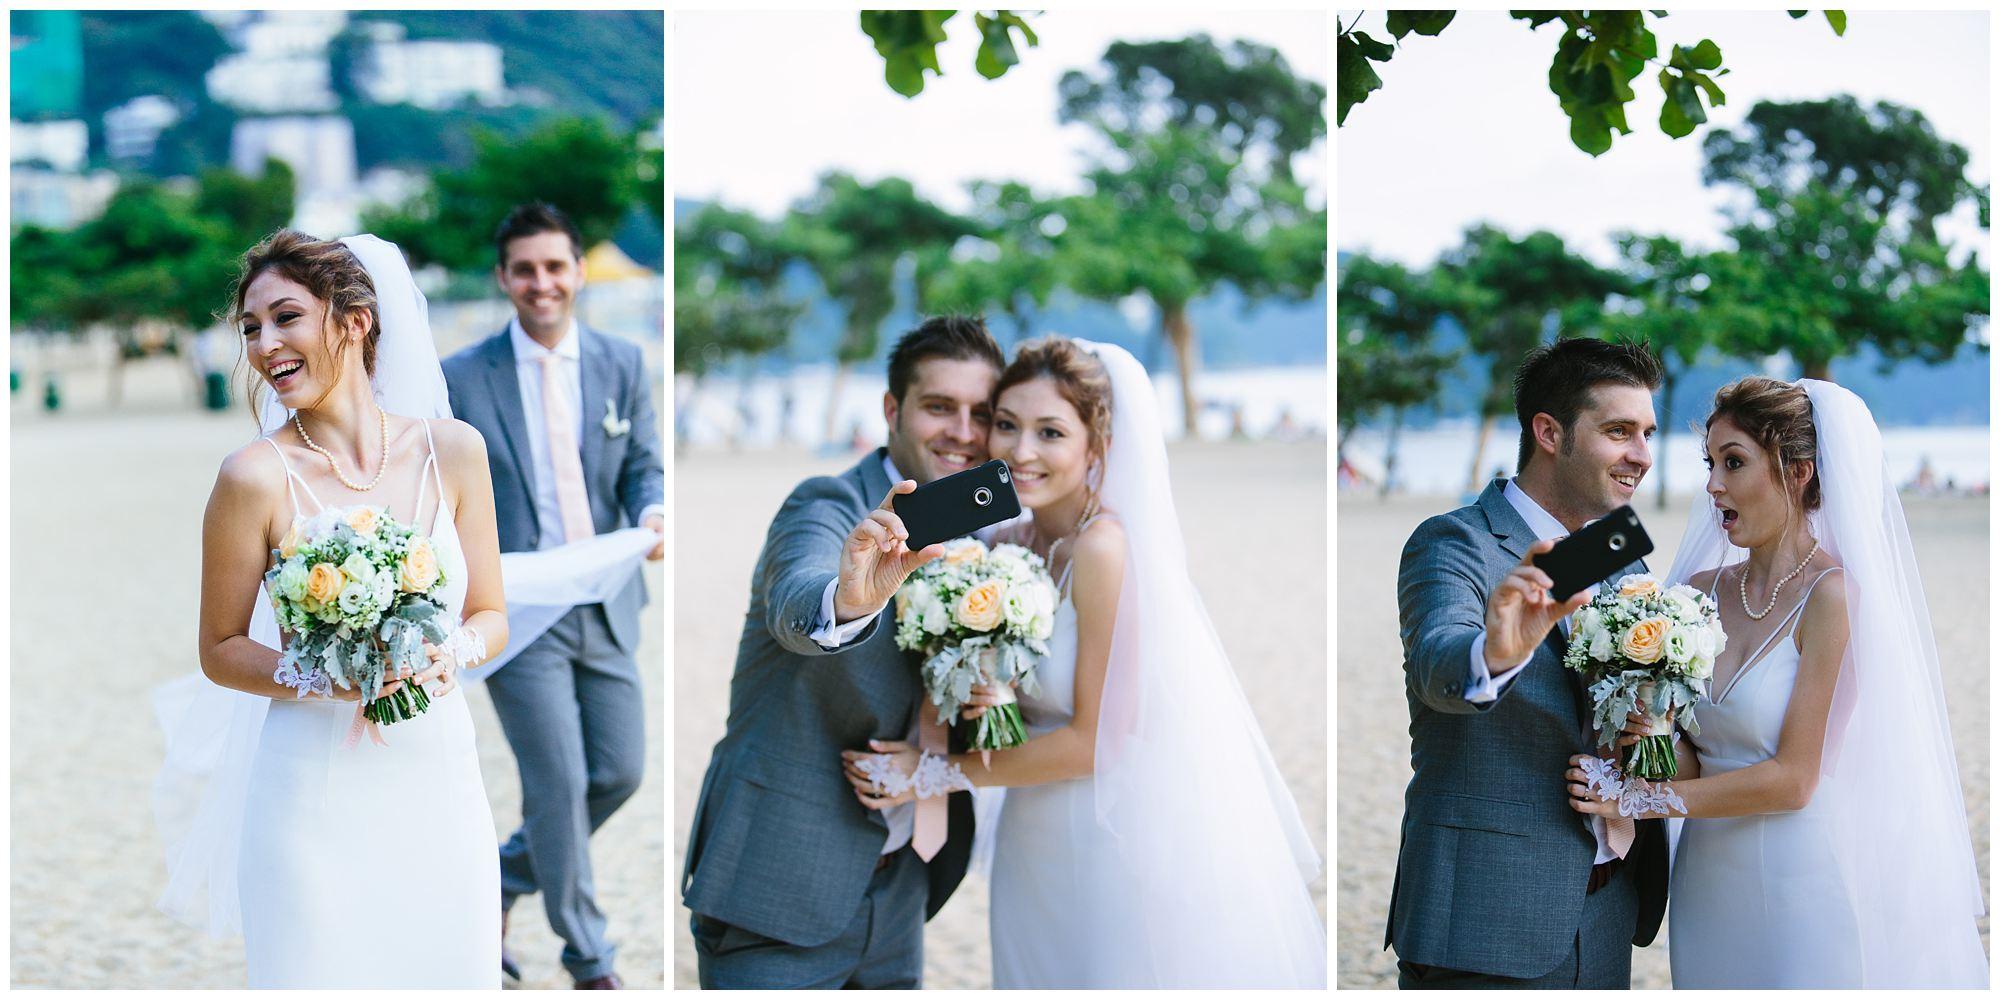 sa-wedding-hong-kong-177